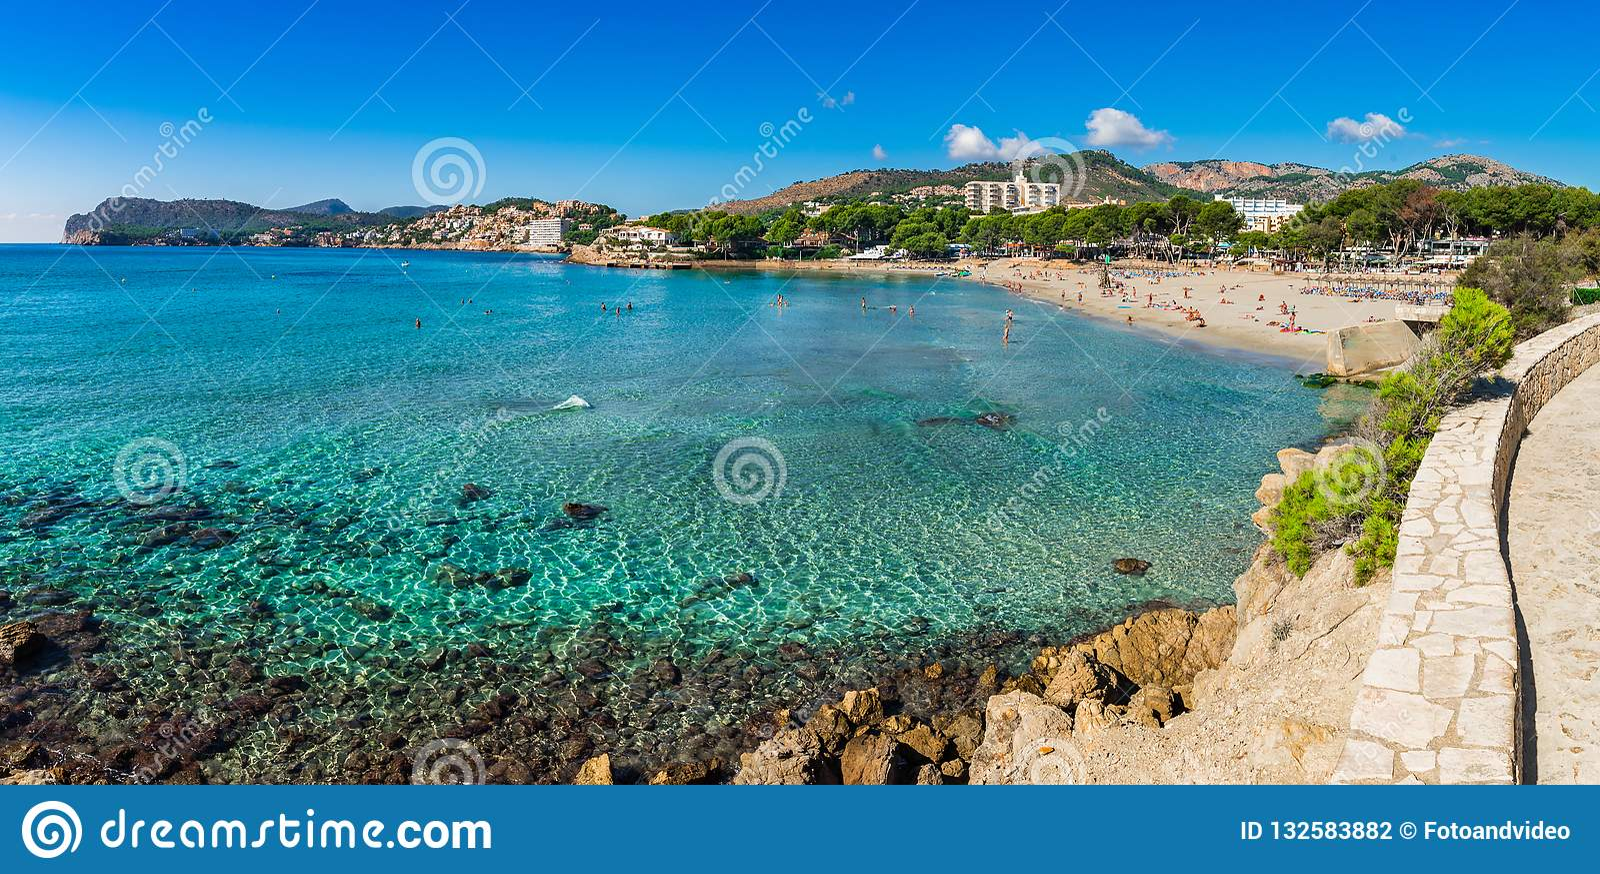 Coast Panorama View Of Paguera Beach On Majorca Island Spain Stock Photo Image Of Holiday People 132583882